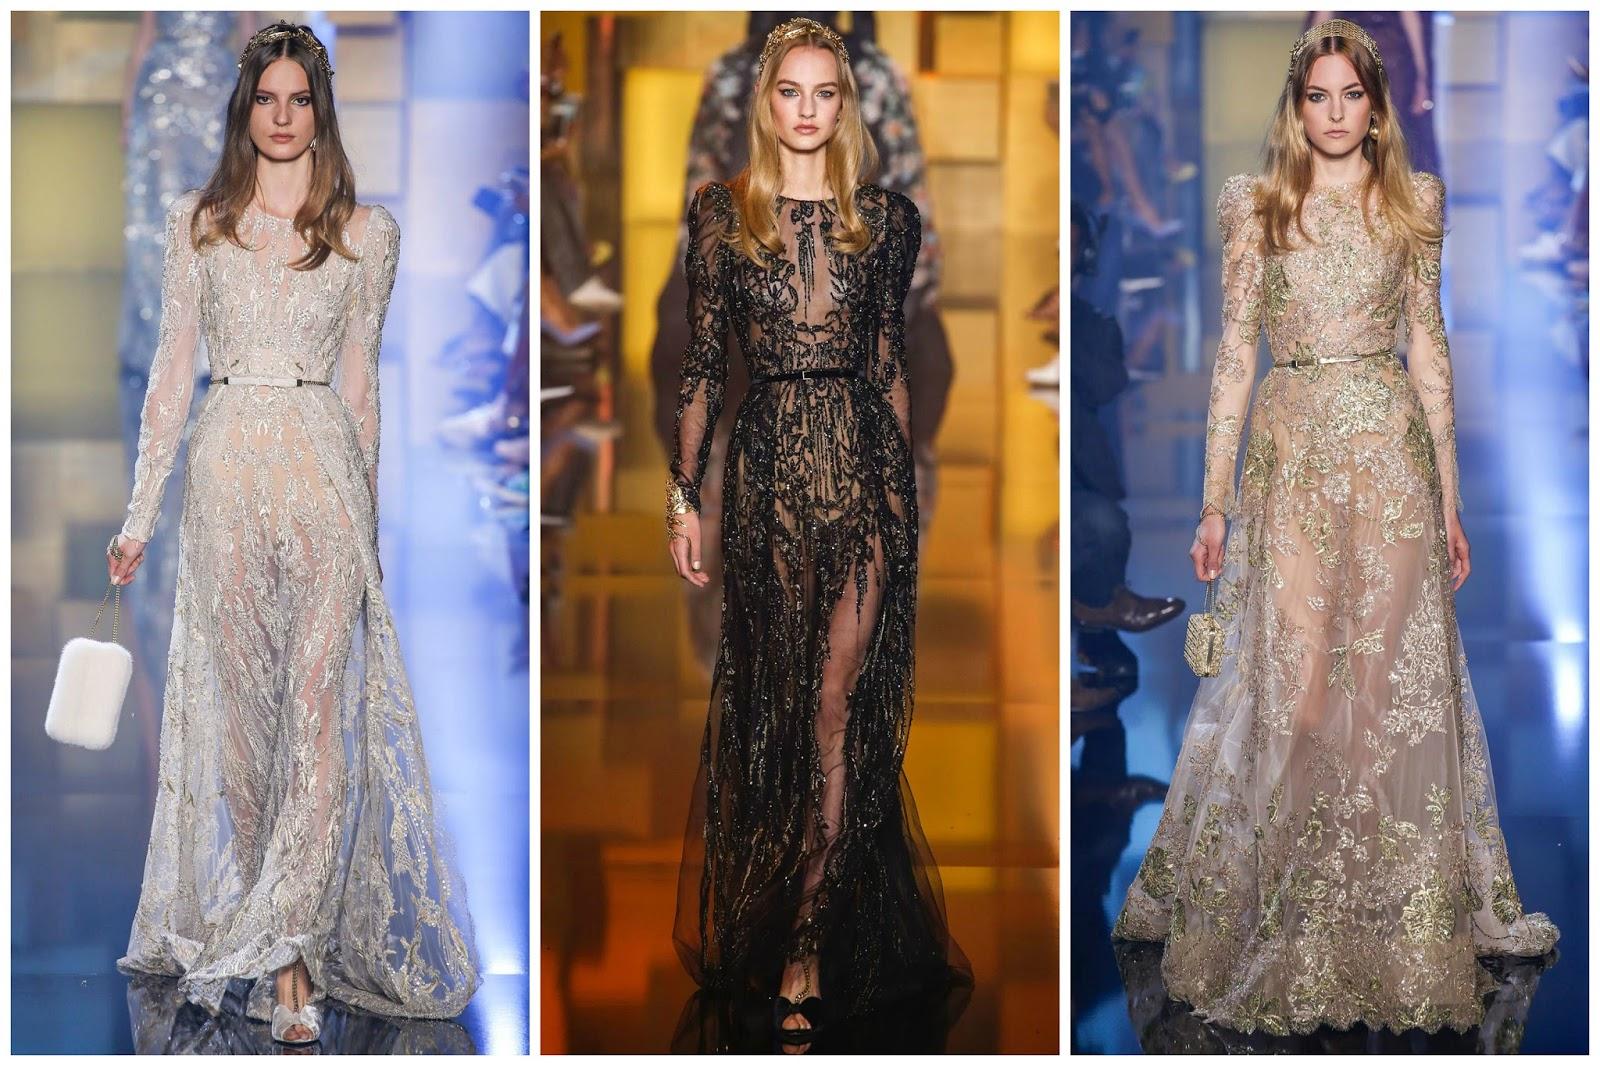 Elie Saab Show 2015 dresses